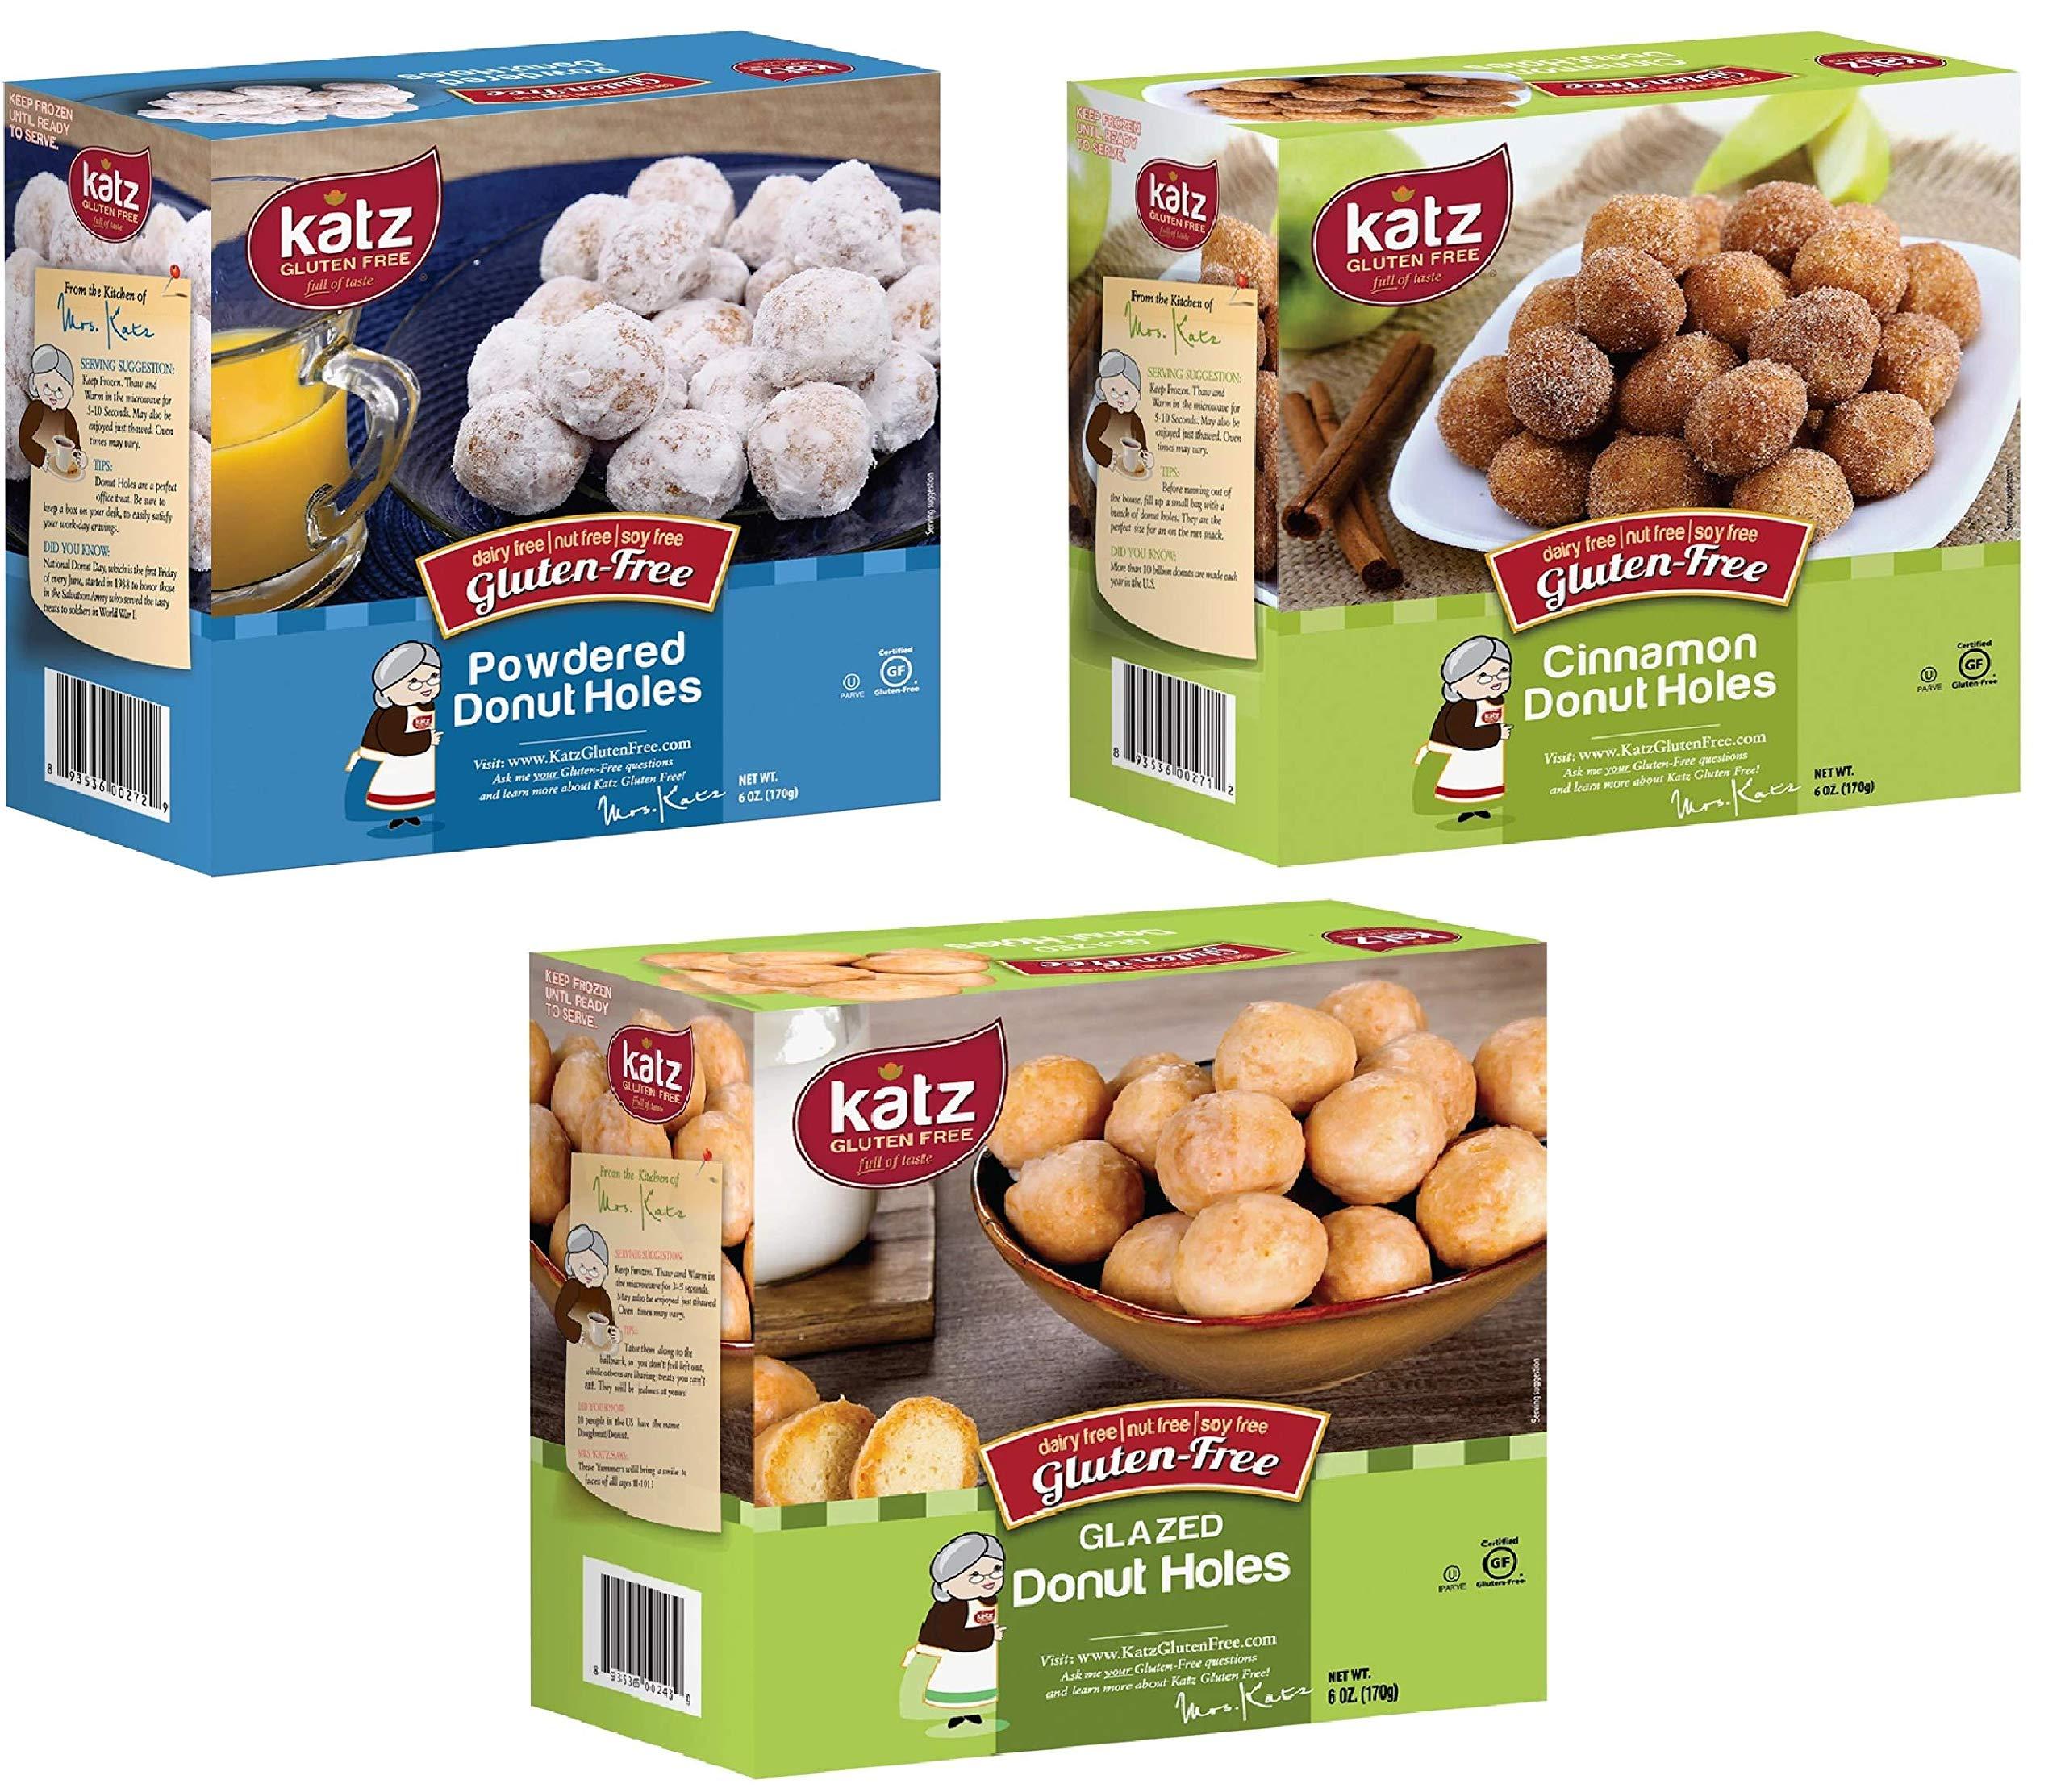 Katz Gluten Free Snacks Donut Holes Variety Pack | Gluten Free, Dairy Free, Soy Free, Nut Free | Powdered, Glazed, Cinnamon | Kosher (1 Pack of each, 3 Total) by Katz Gluten Free